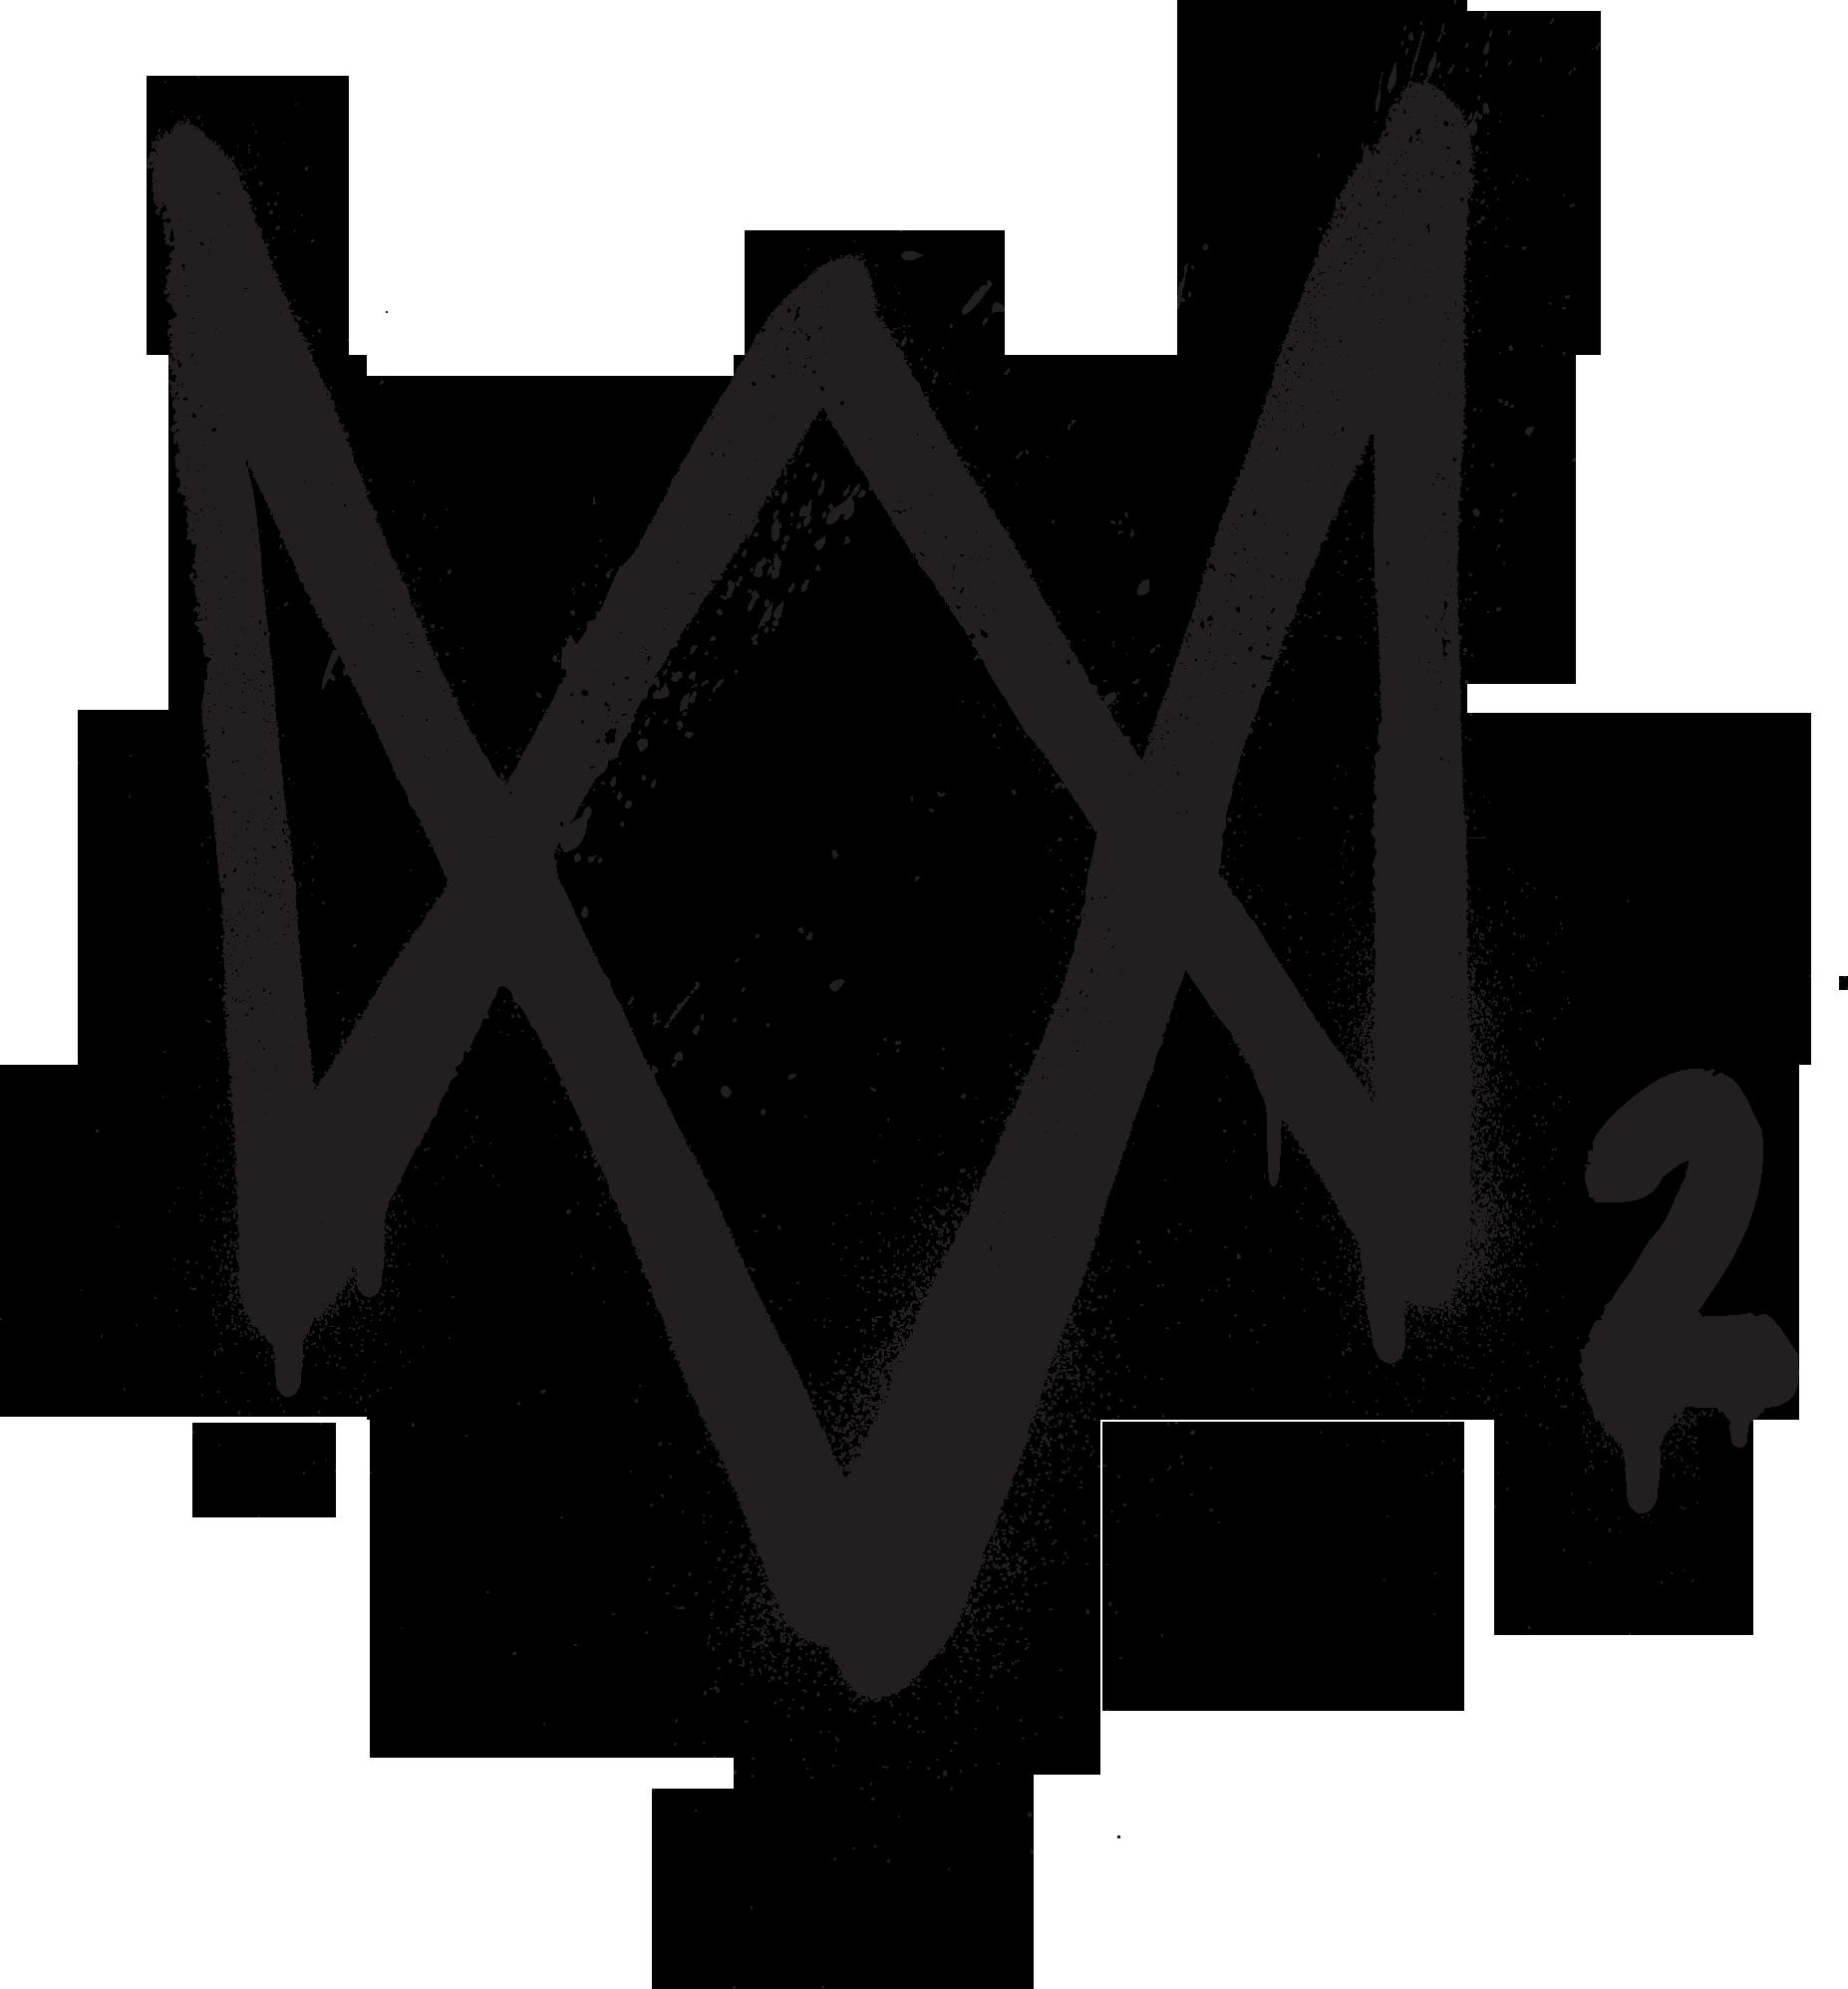 Watch Dogs 2 Fancy Logo Png 1854 1995 Decoracoes Faceis Tatuagens Decoracao